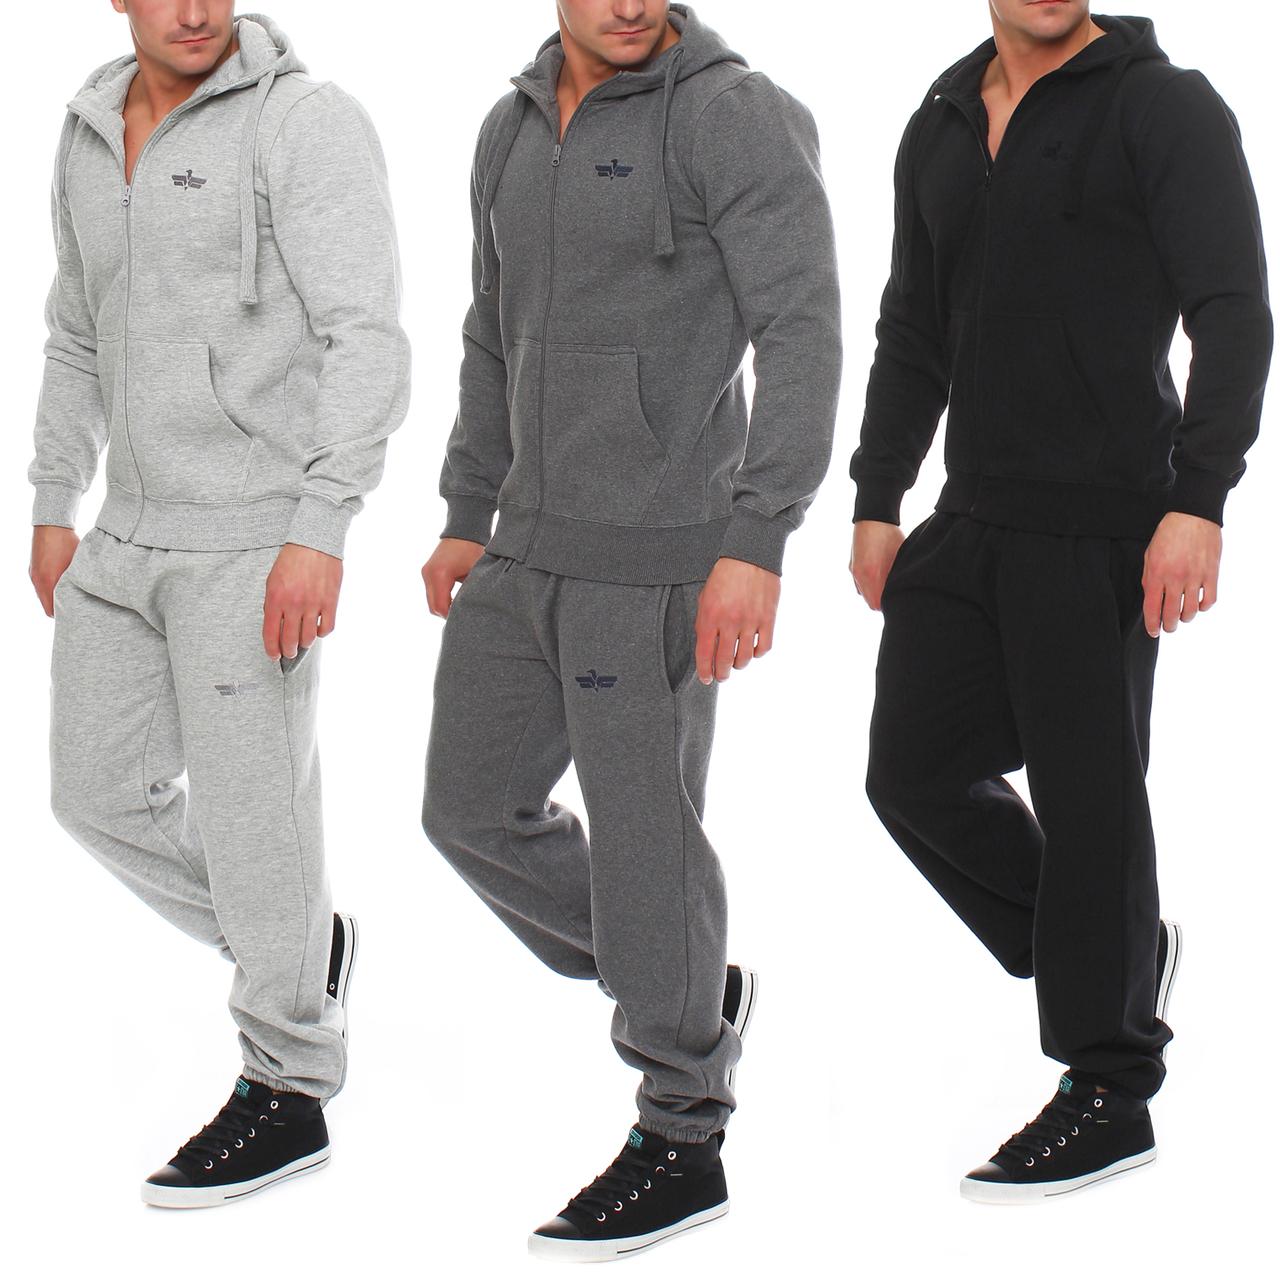 finchman finchsuit 1 herren jogging anzug trainingsanzug. Black Bedroom Furniture Sets. Home Design Ideas